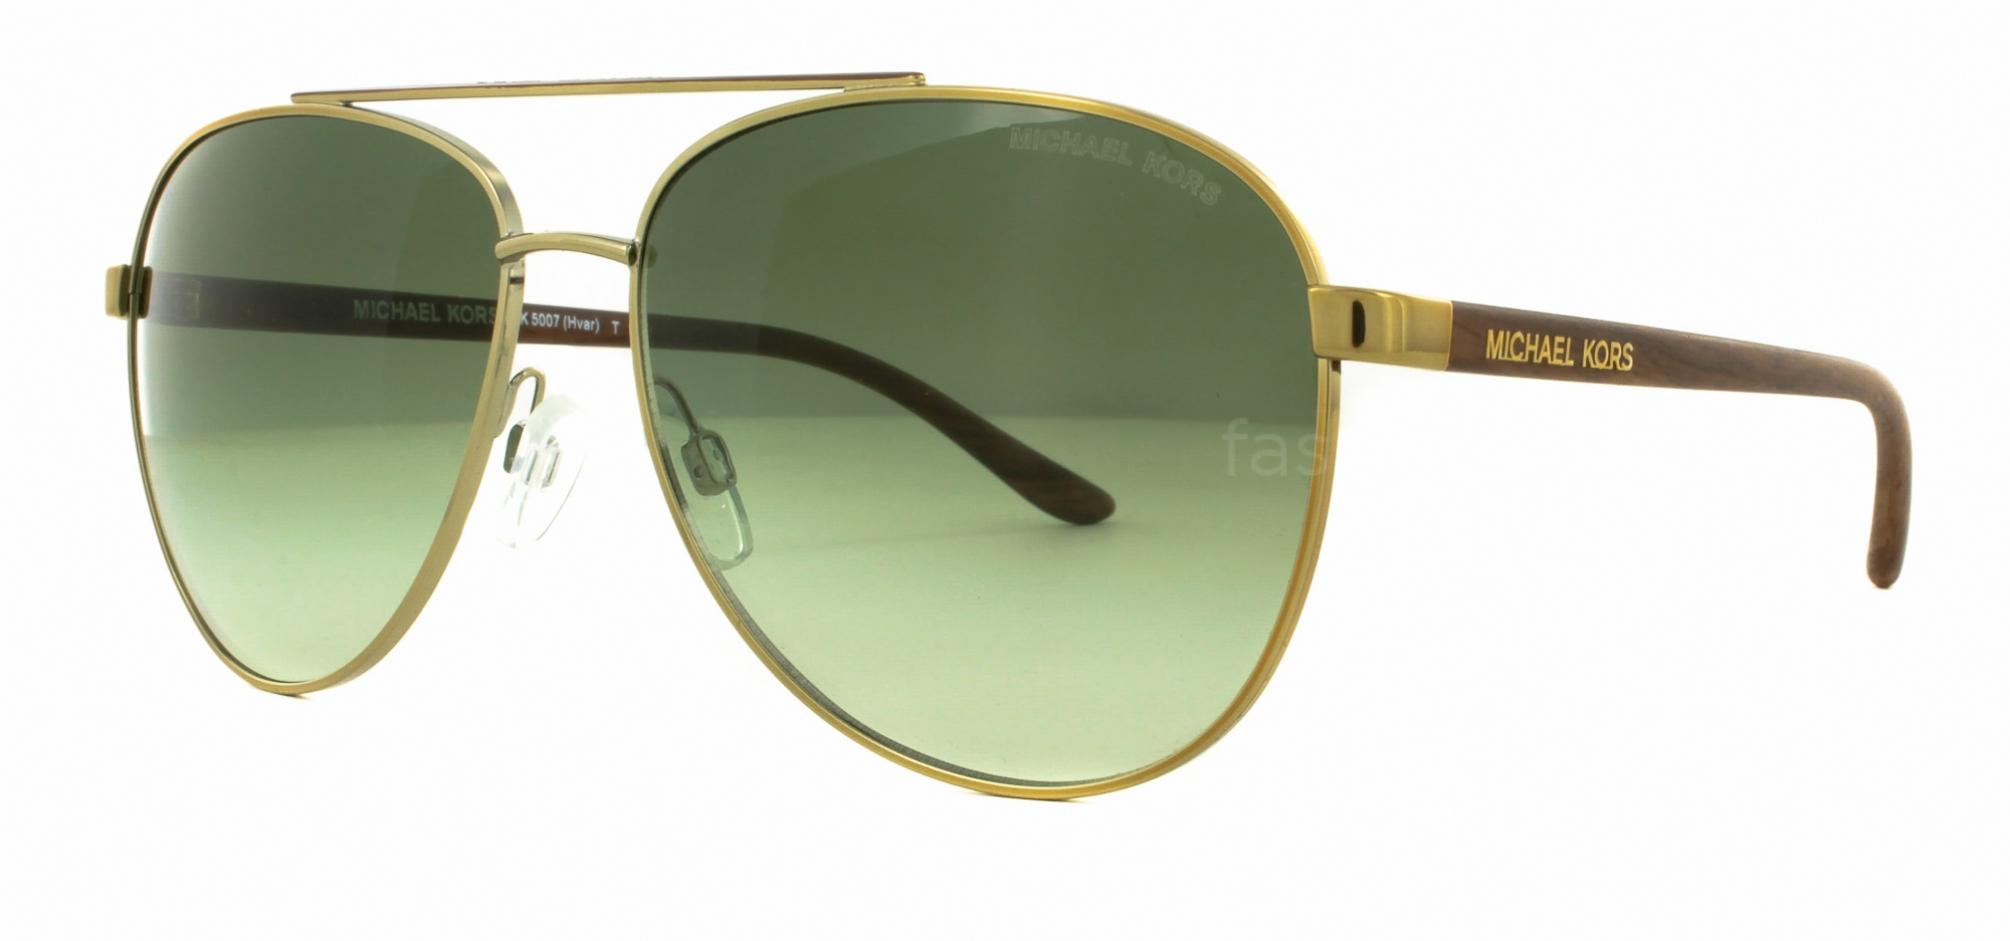 b0dcdbeb39 Michael Kors Hvar Sunglasses